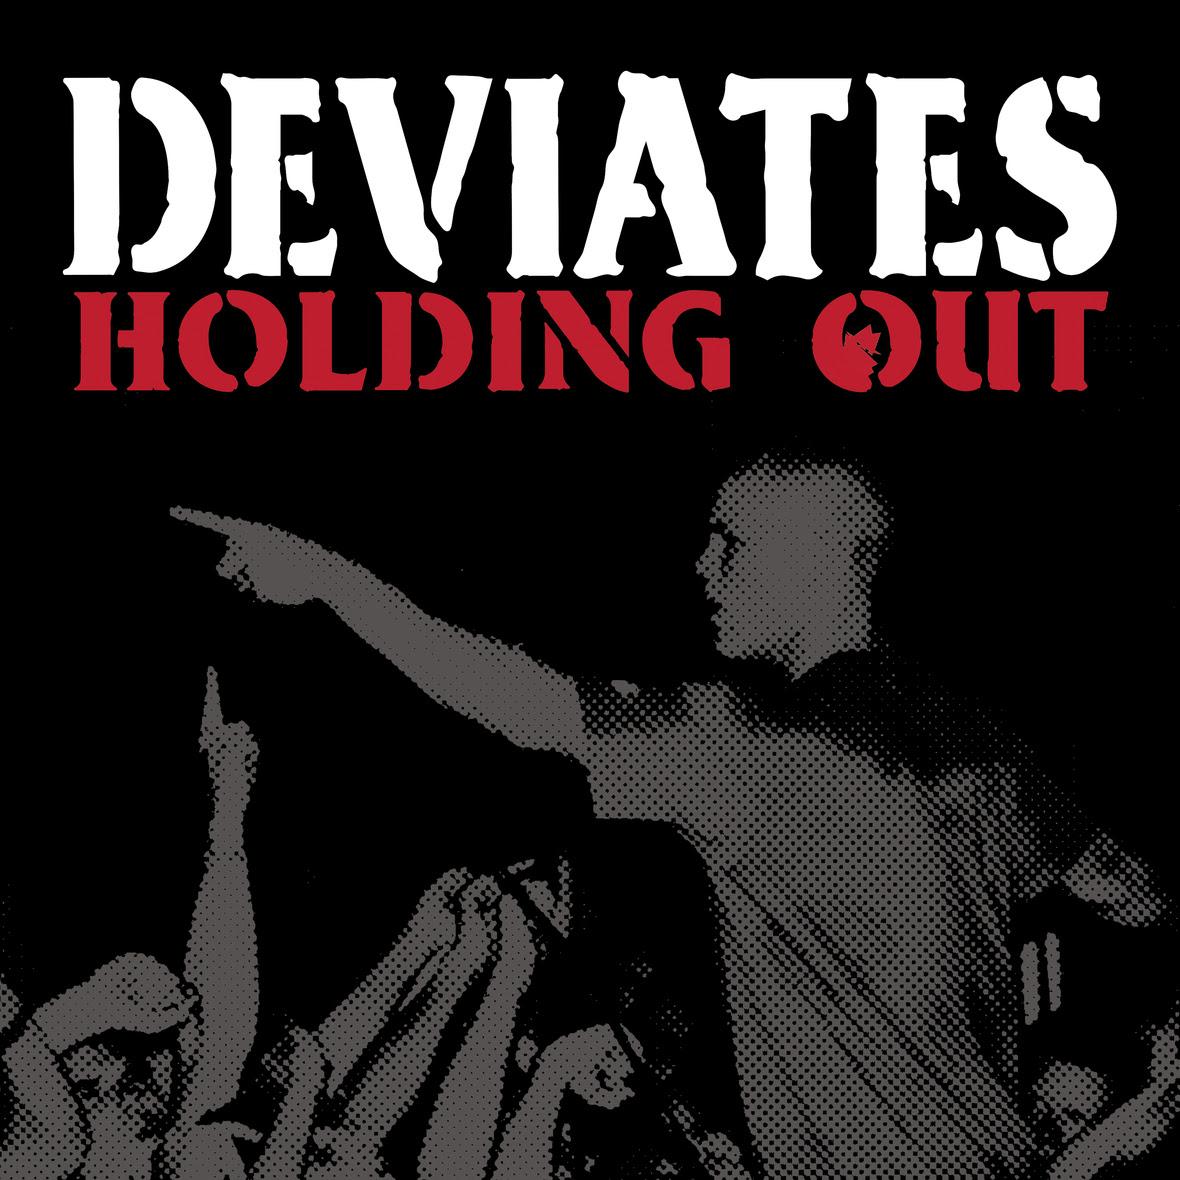 DEVIATES-ALBUM COVER-WEB